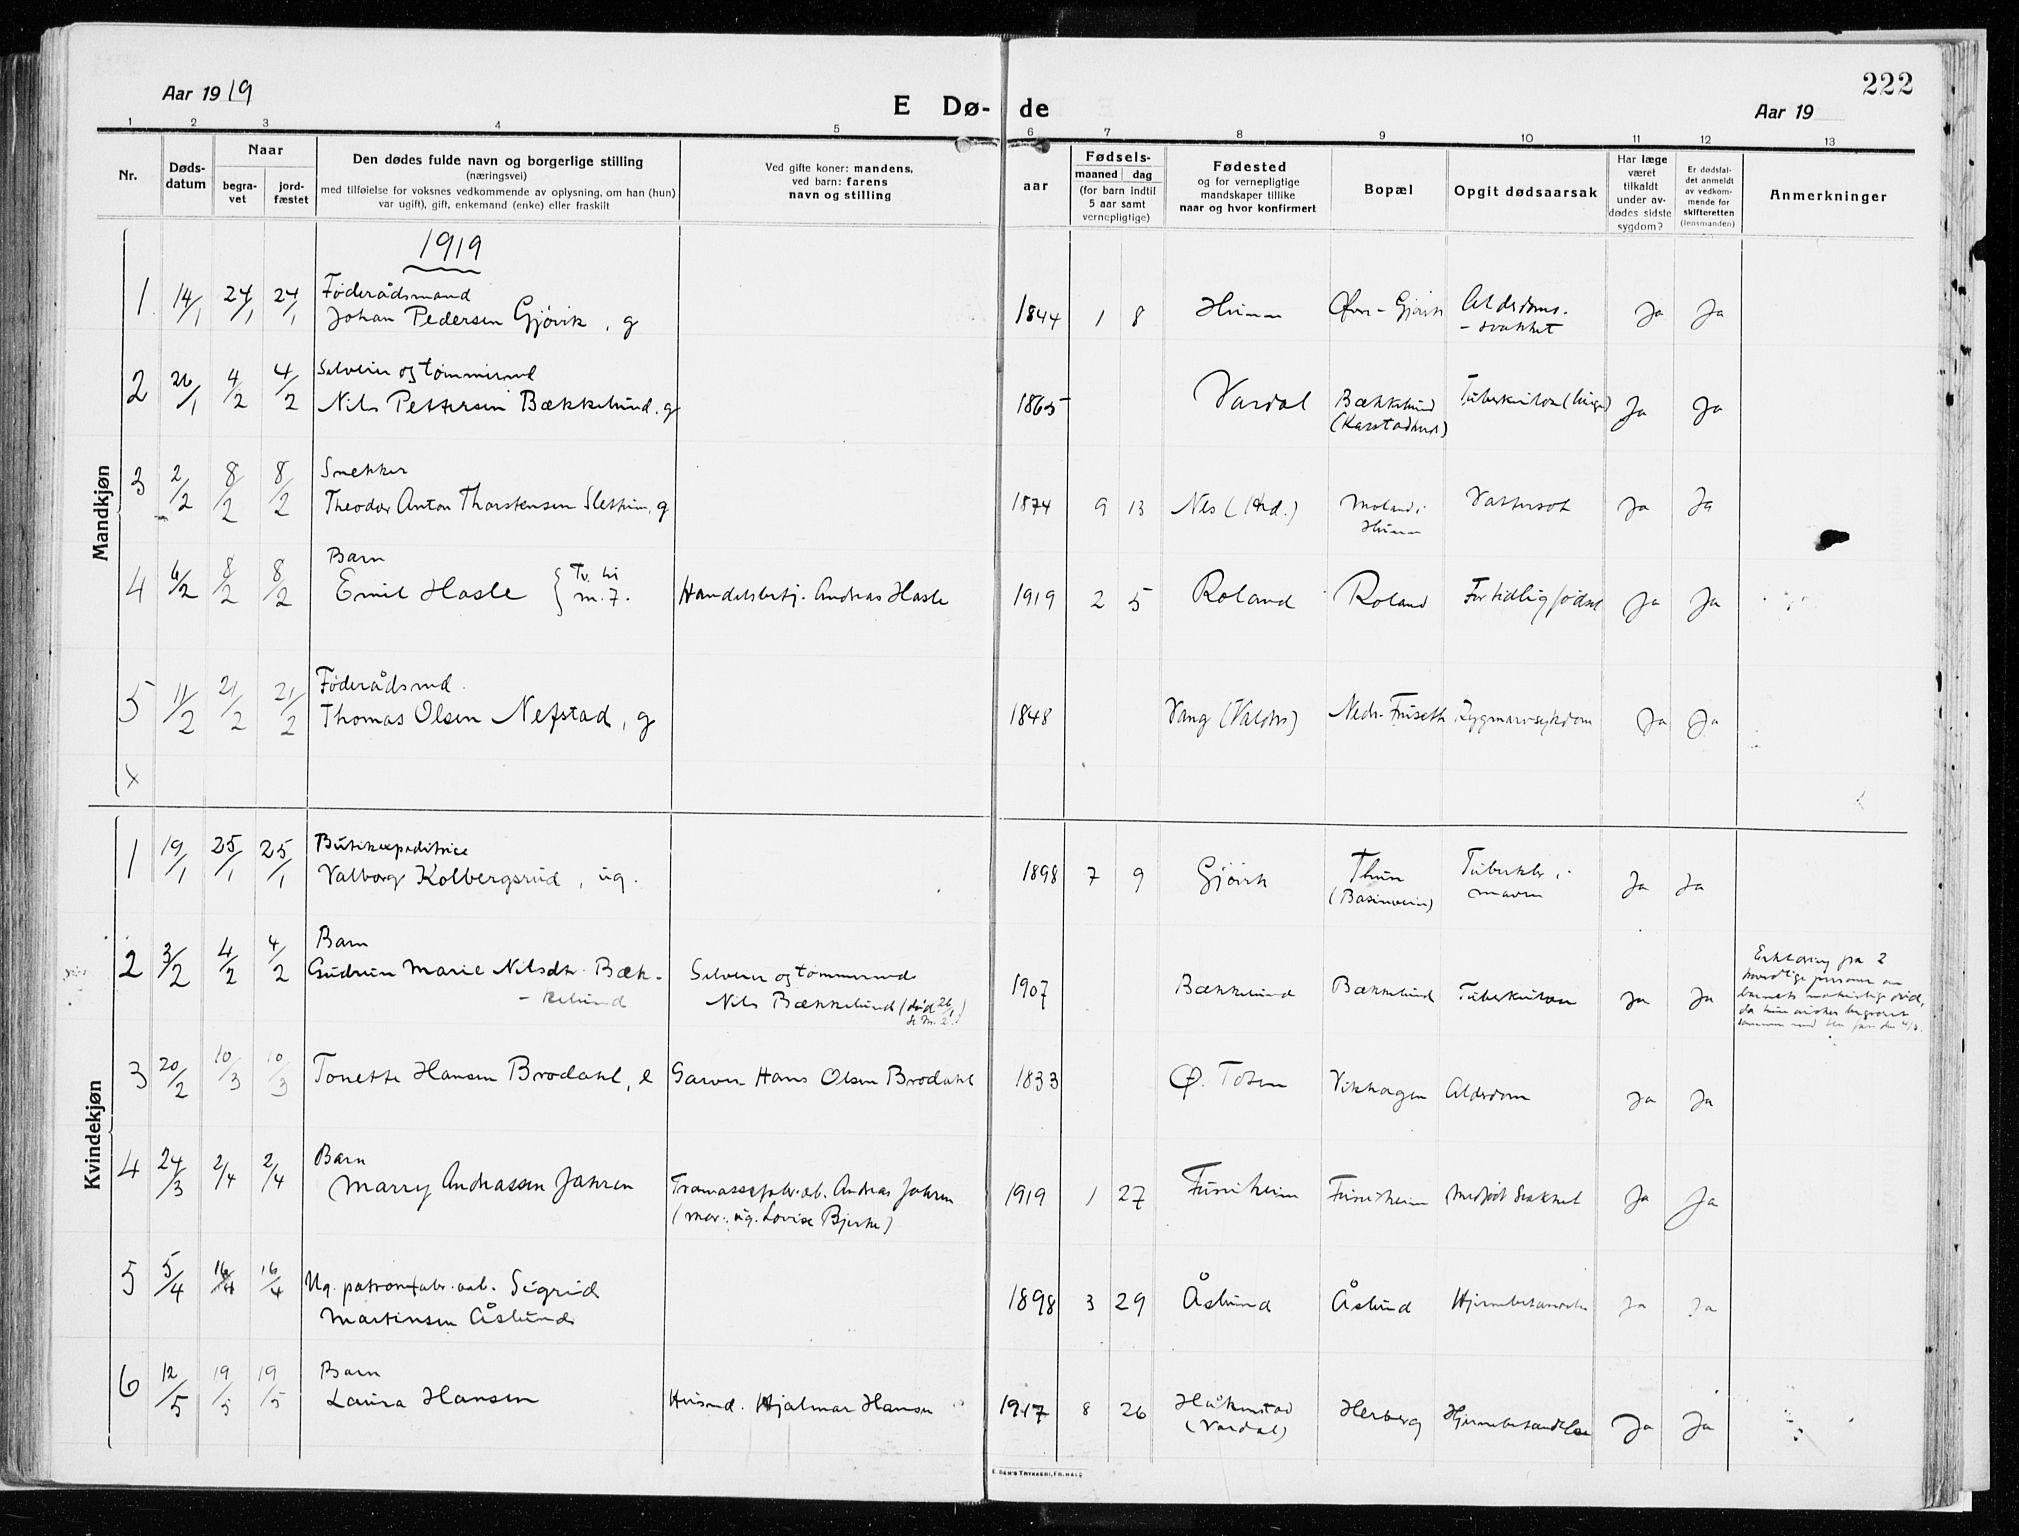 SAH, Vardal prestekontor, H/Ha/Haa/L0017: Ministerialbok nr. 17, 1915-1929, s. 222